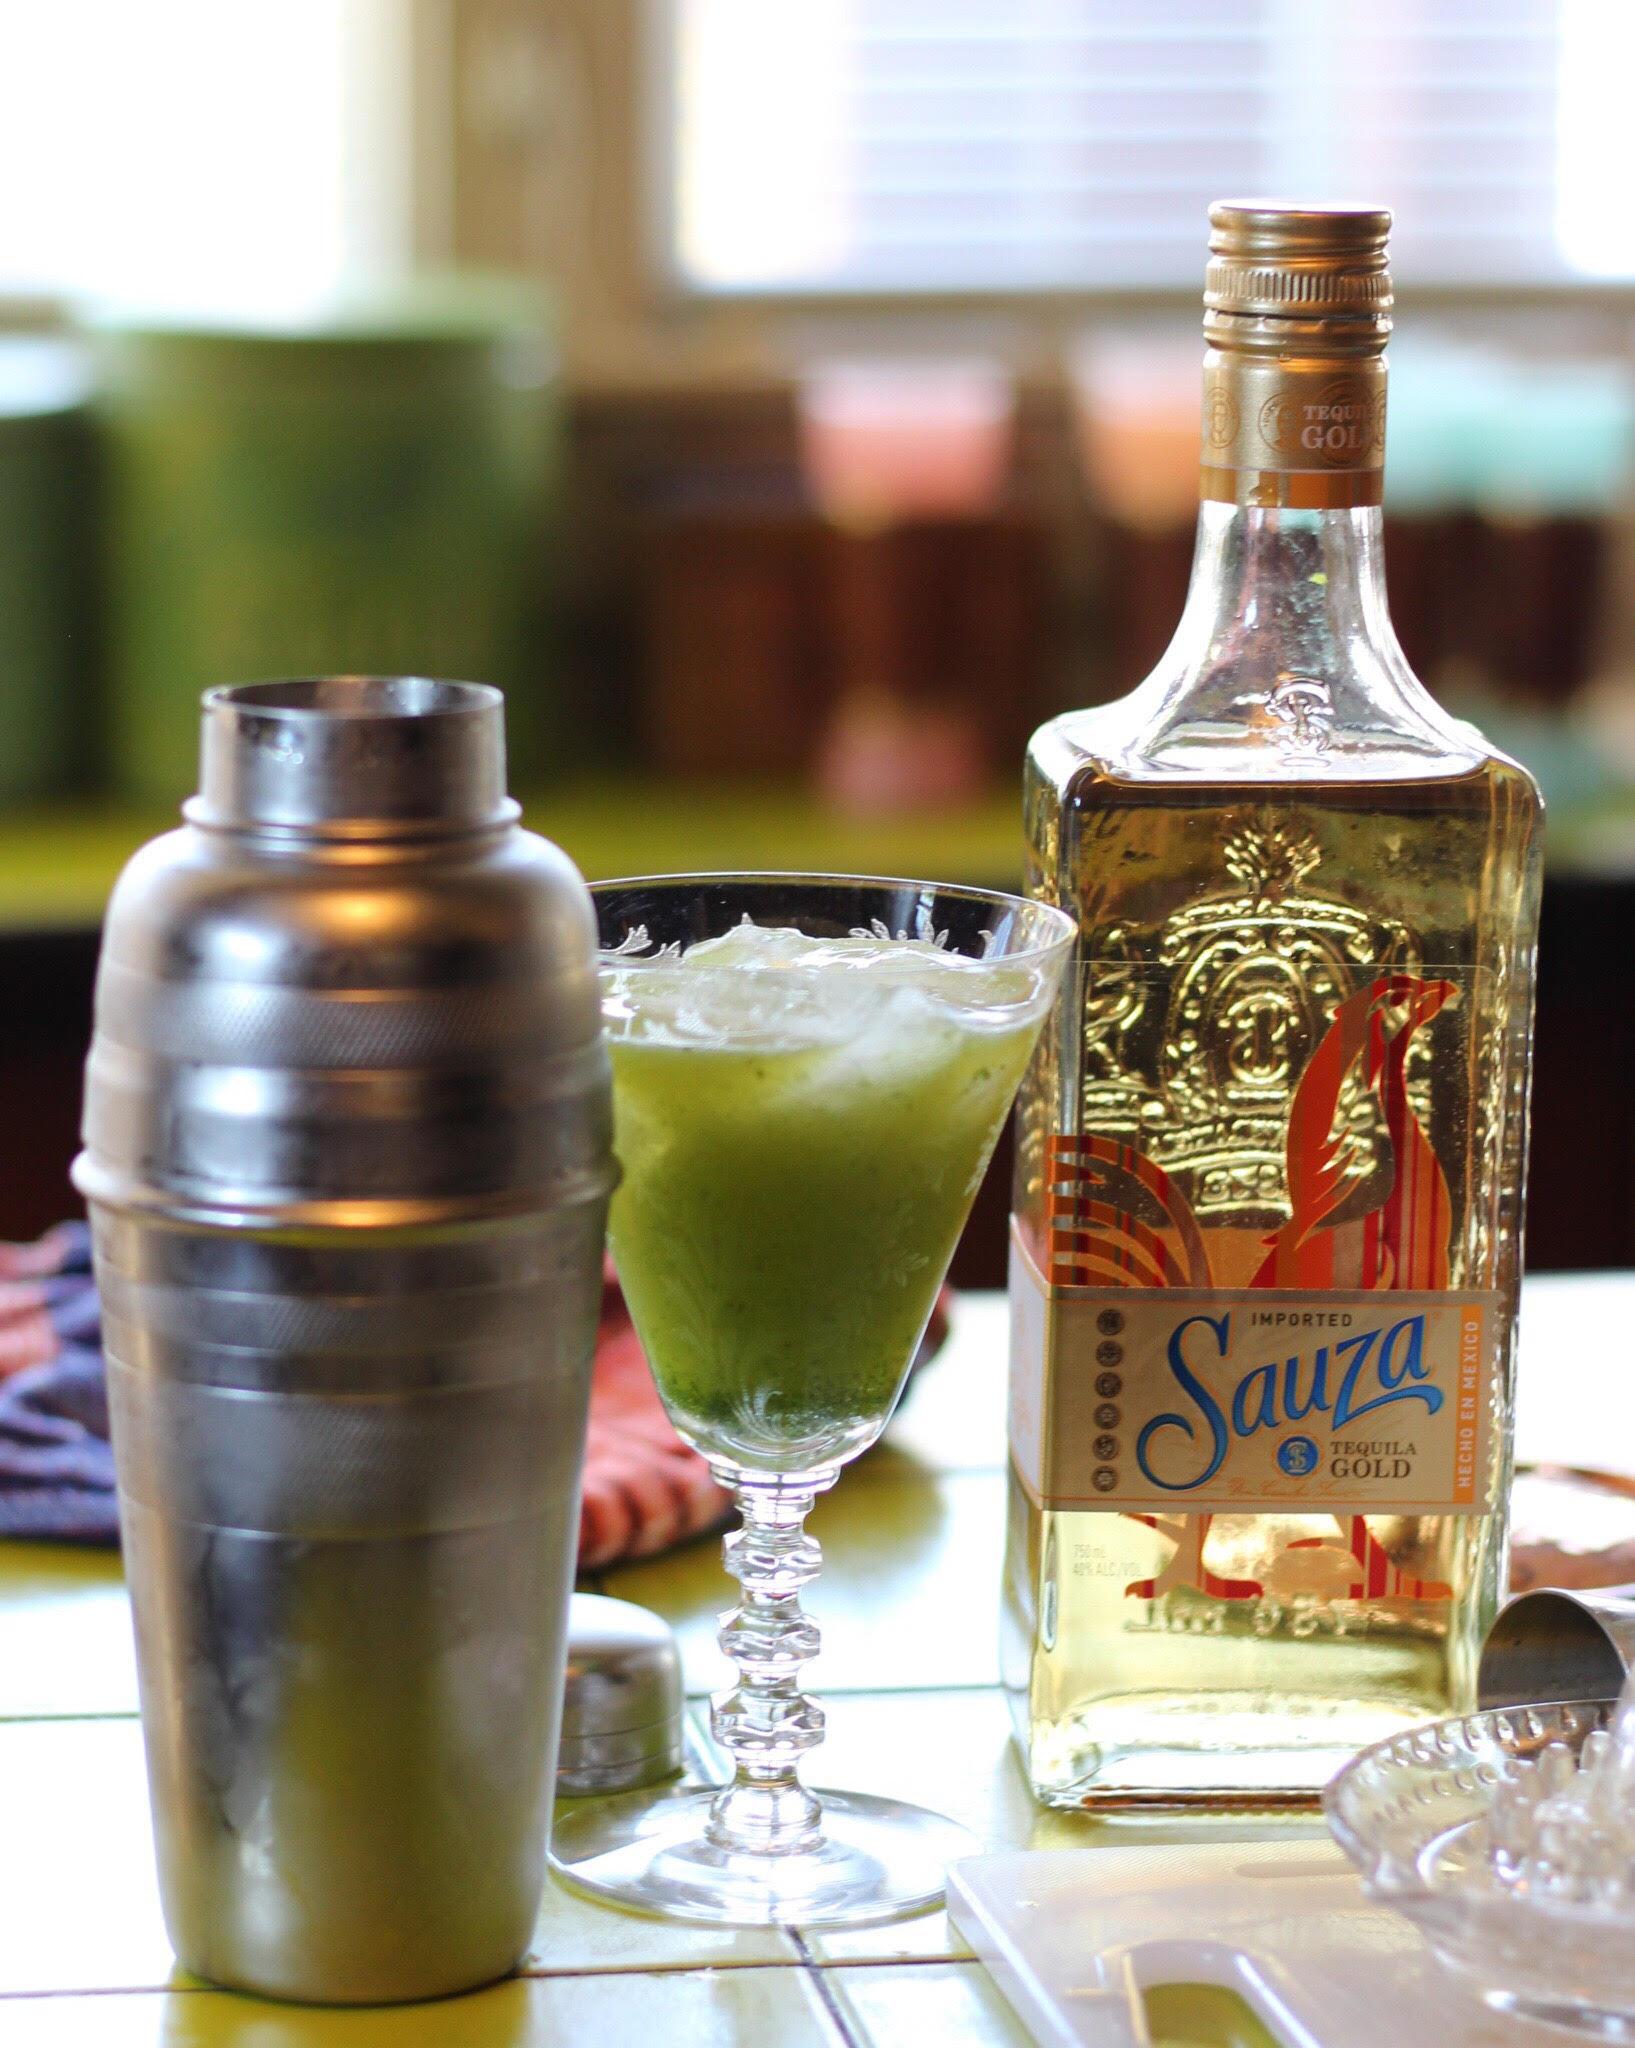 Pepita-Bonita-cocktails-and-craft-recipe.jpg